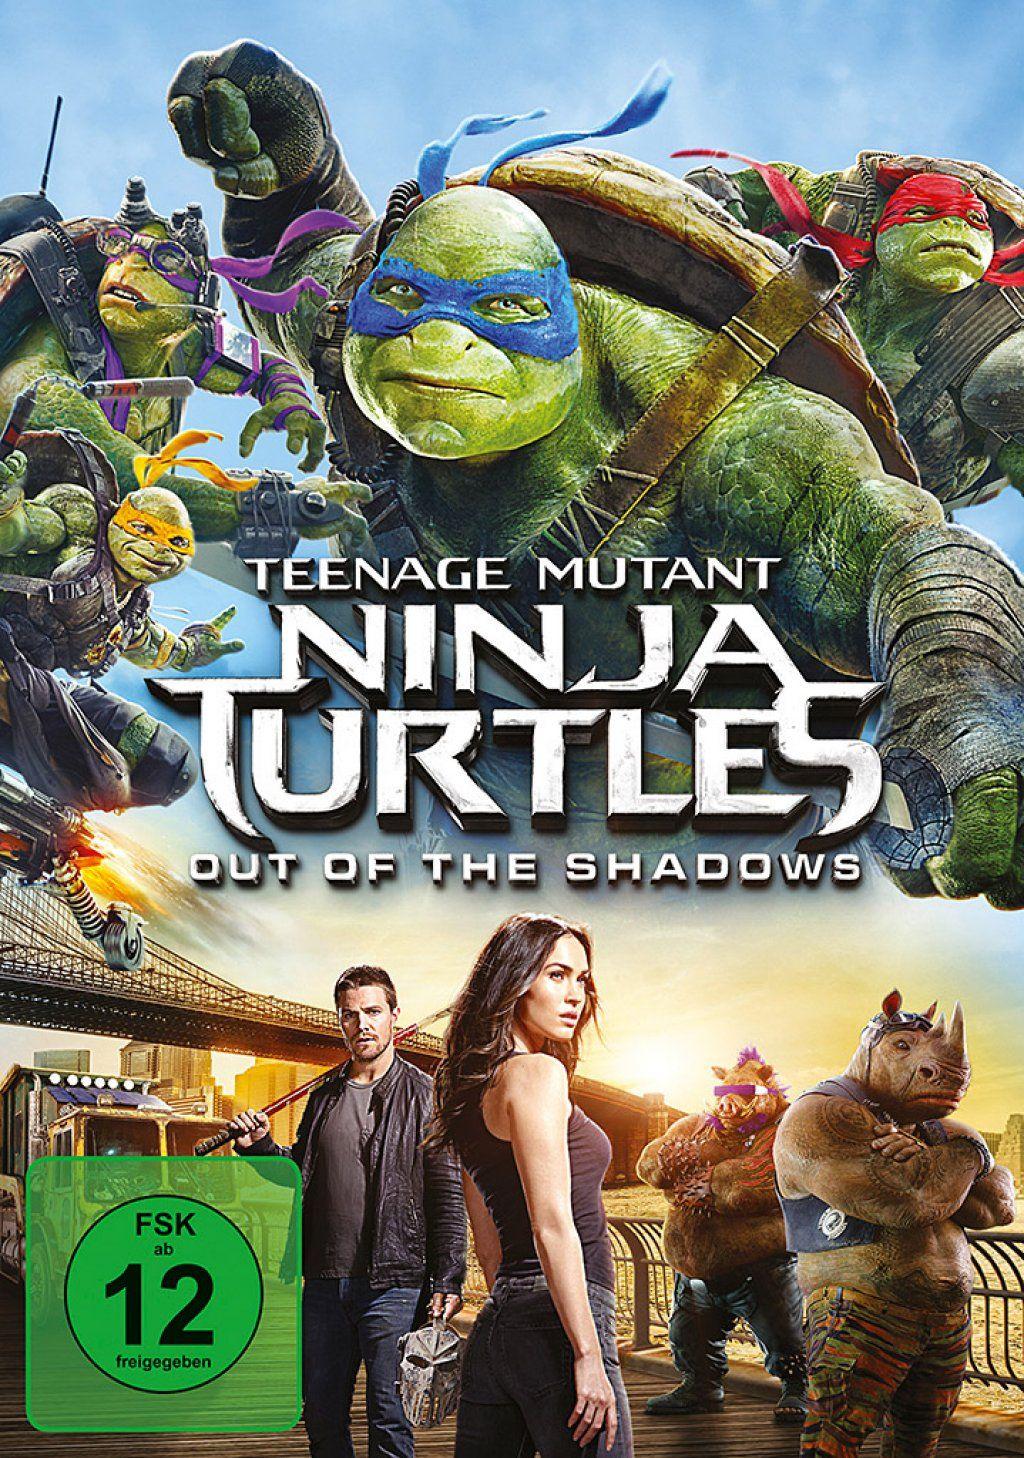 Teenage Mutant Ninja Turtles - Out of the Shadows